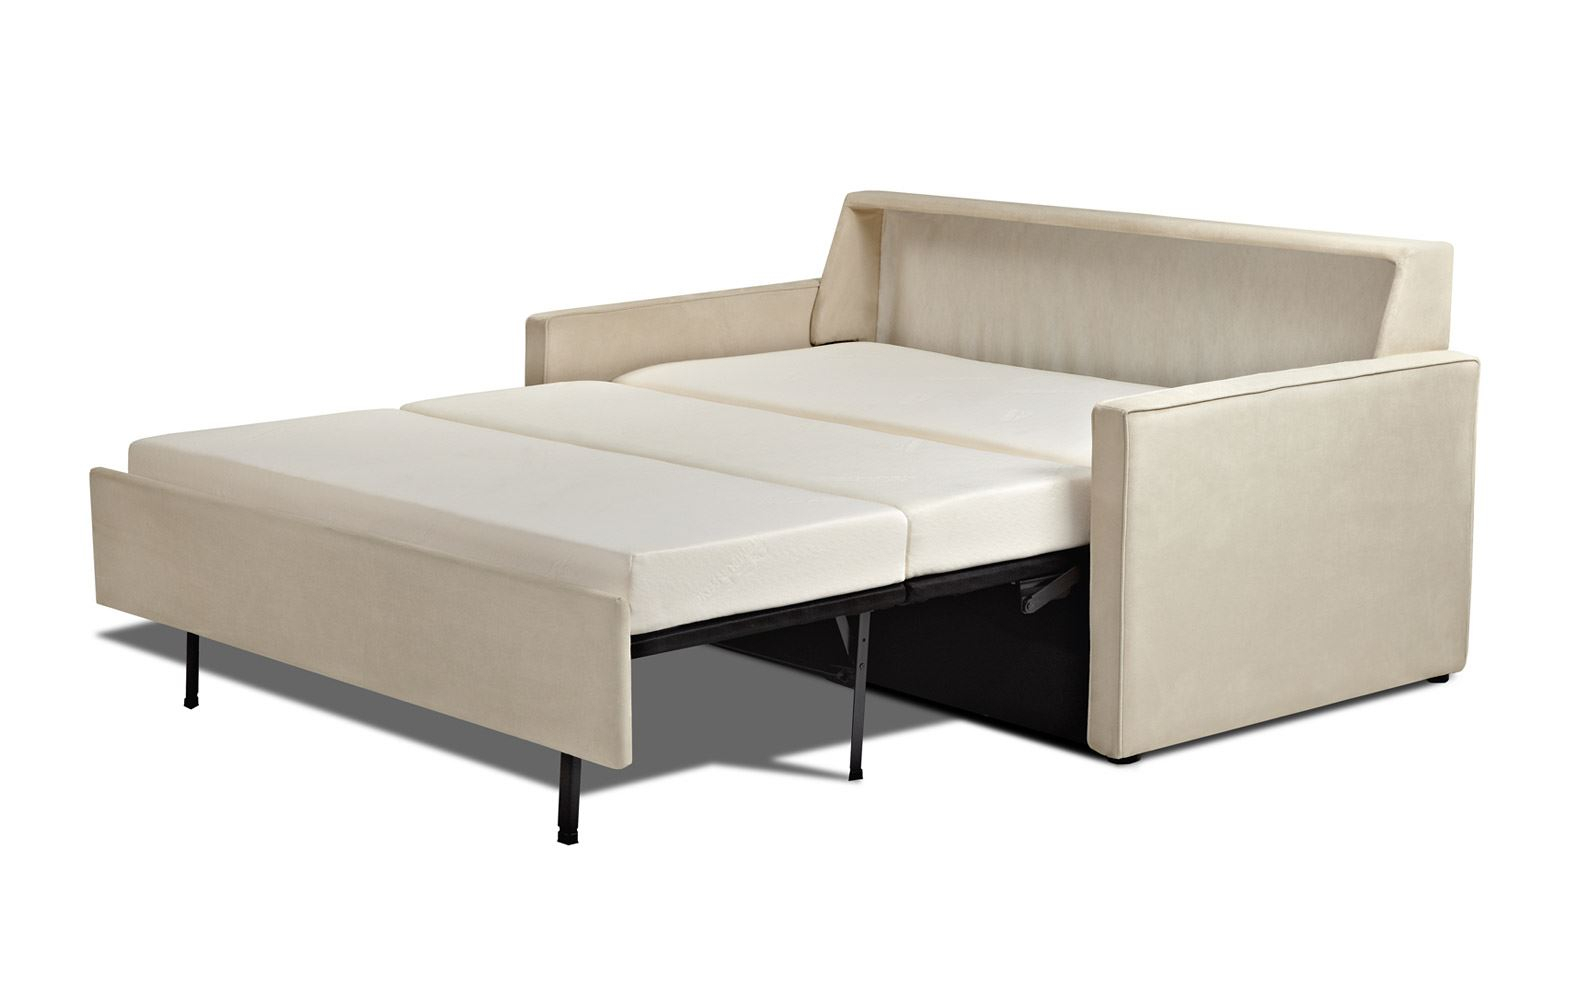 Posh Tempurpedic Sofa Bed Design For Fashionable Pertaining To Felton Modern Style Pullout Sleeper Sofas Black (View 12 of 15)